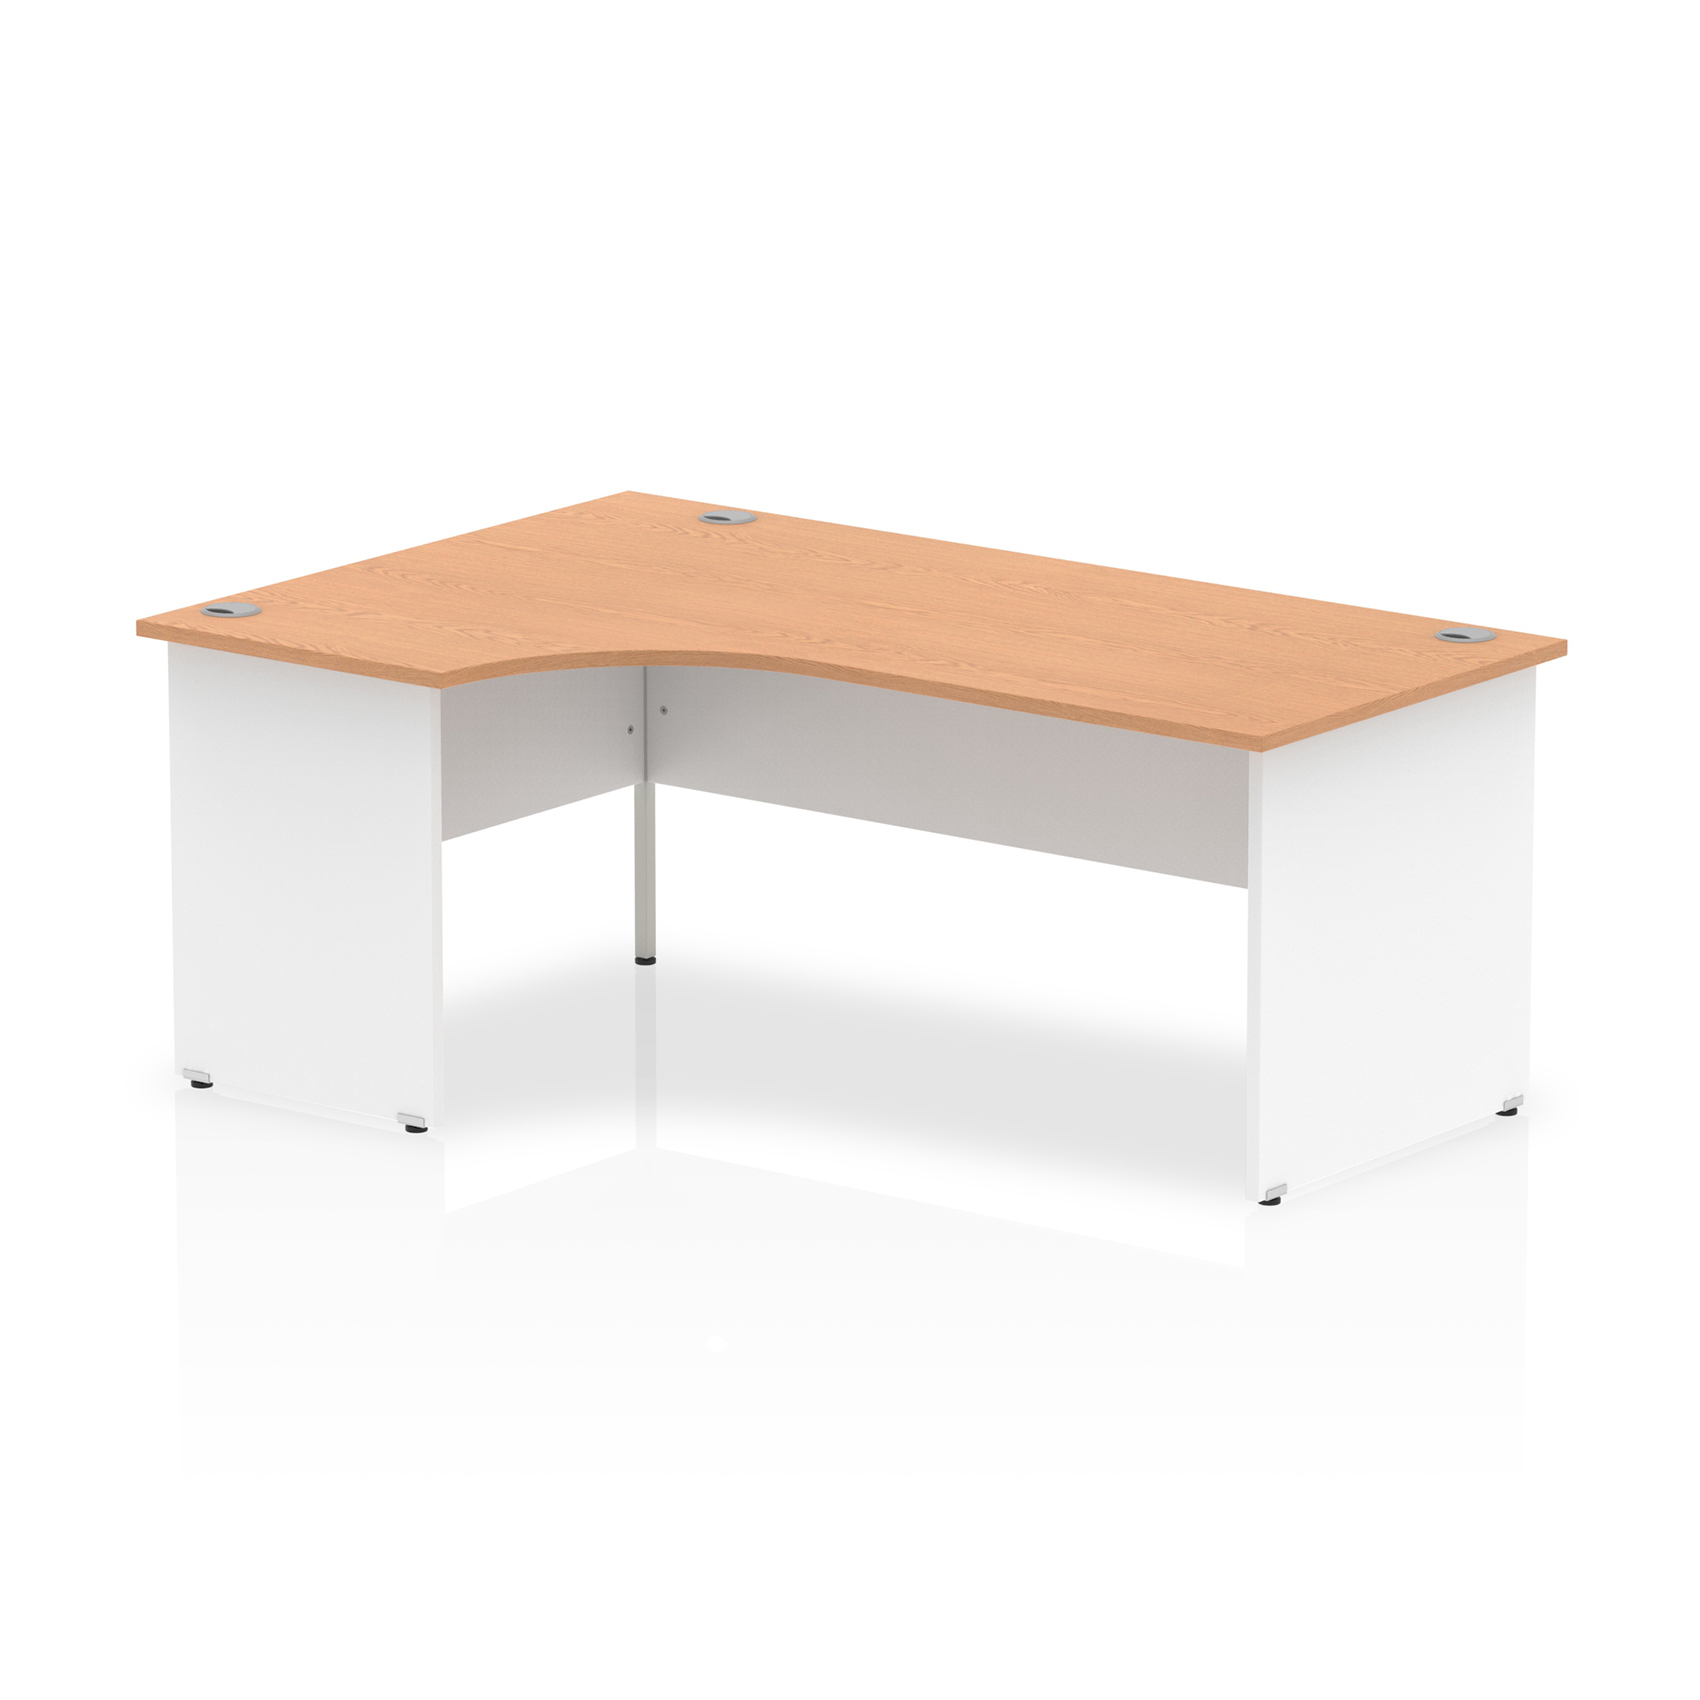 Trexus Desk Crescent Left Hand Panel End 1800x800mm Oak Top White Panels Ref TT000035